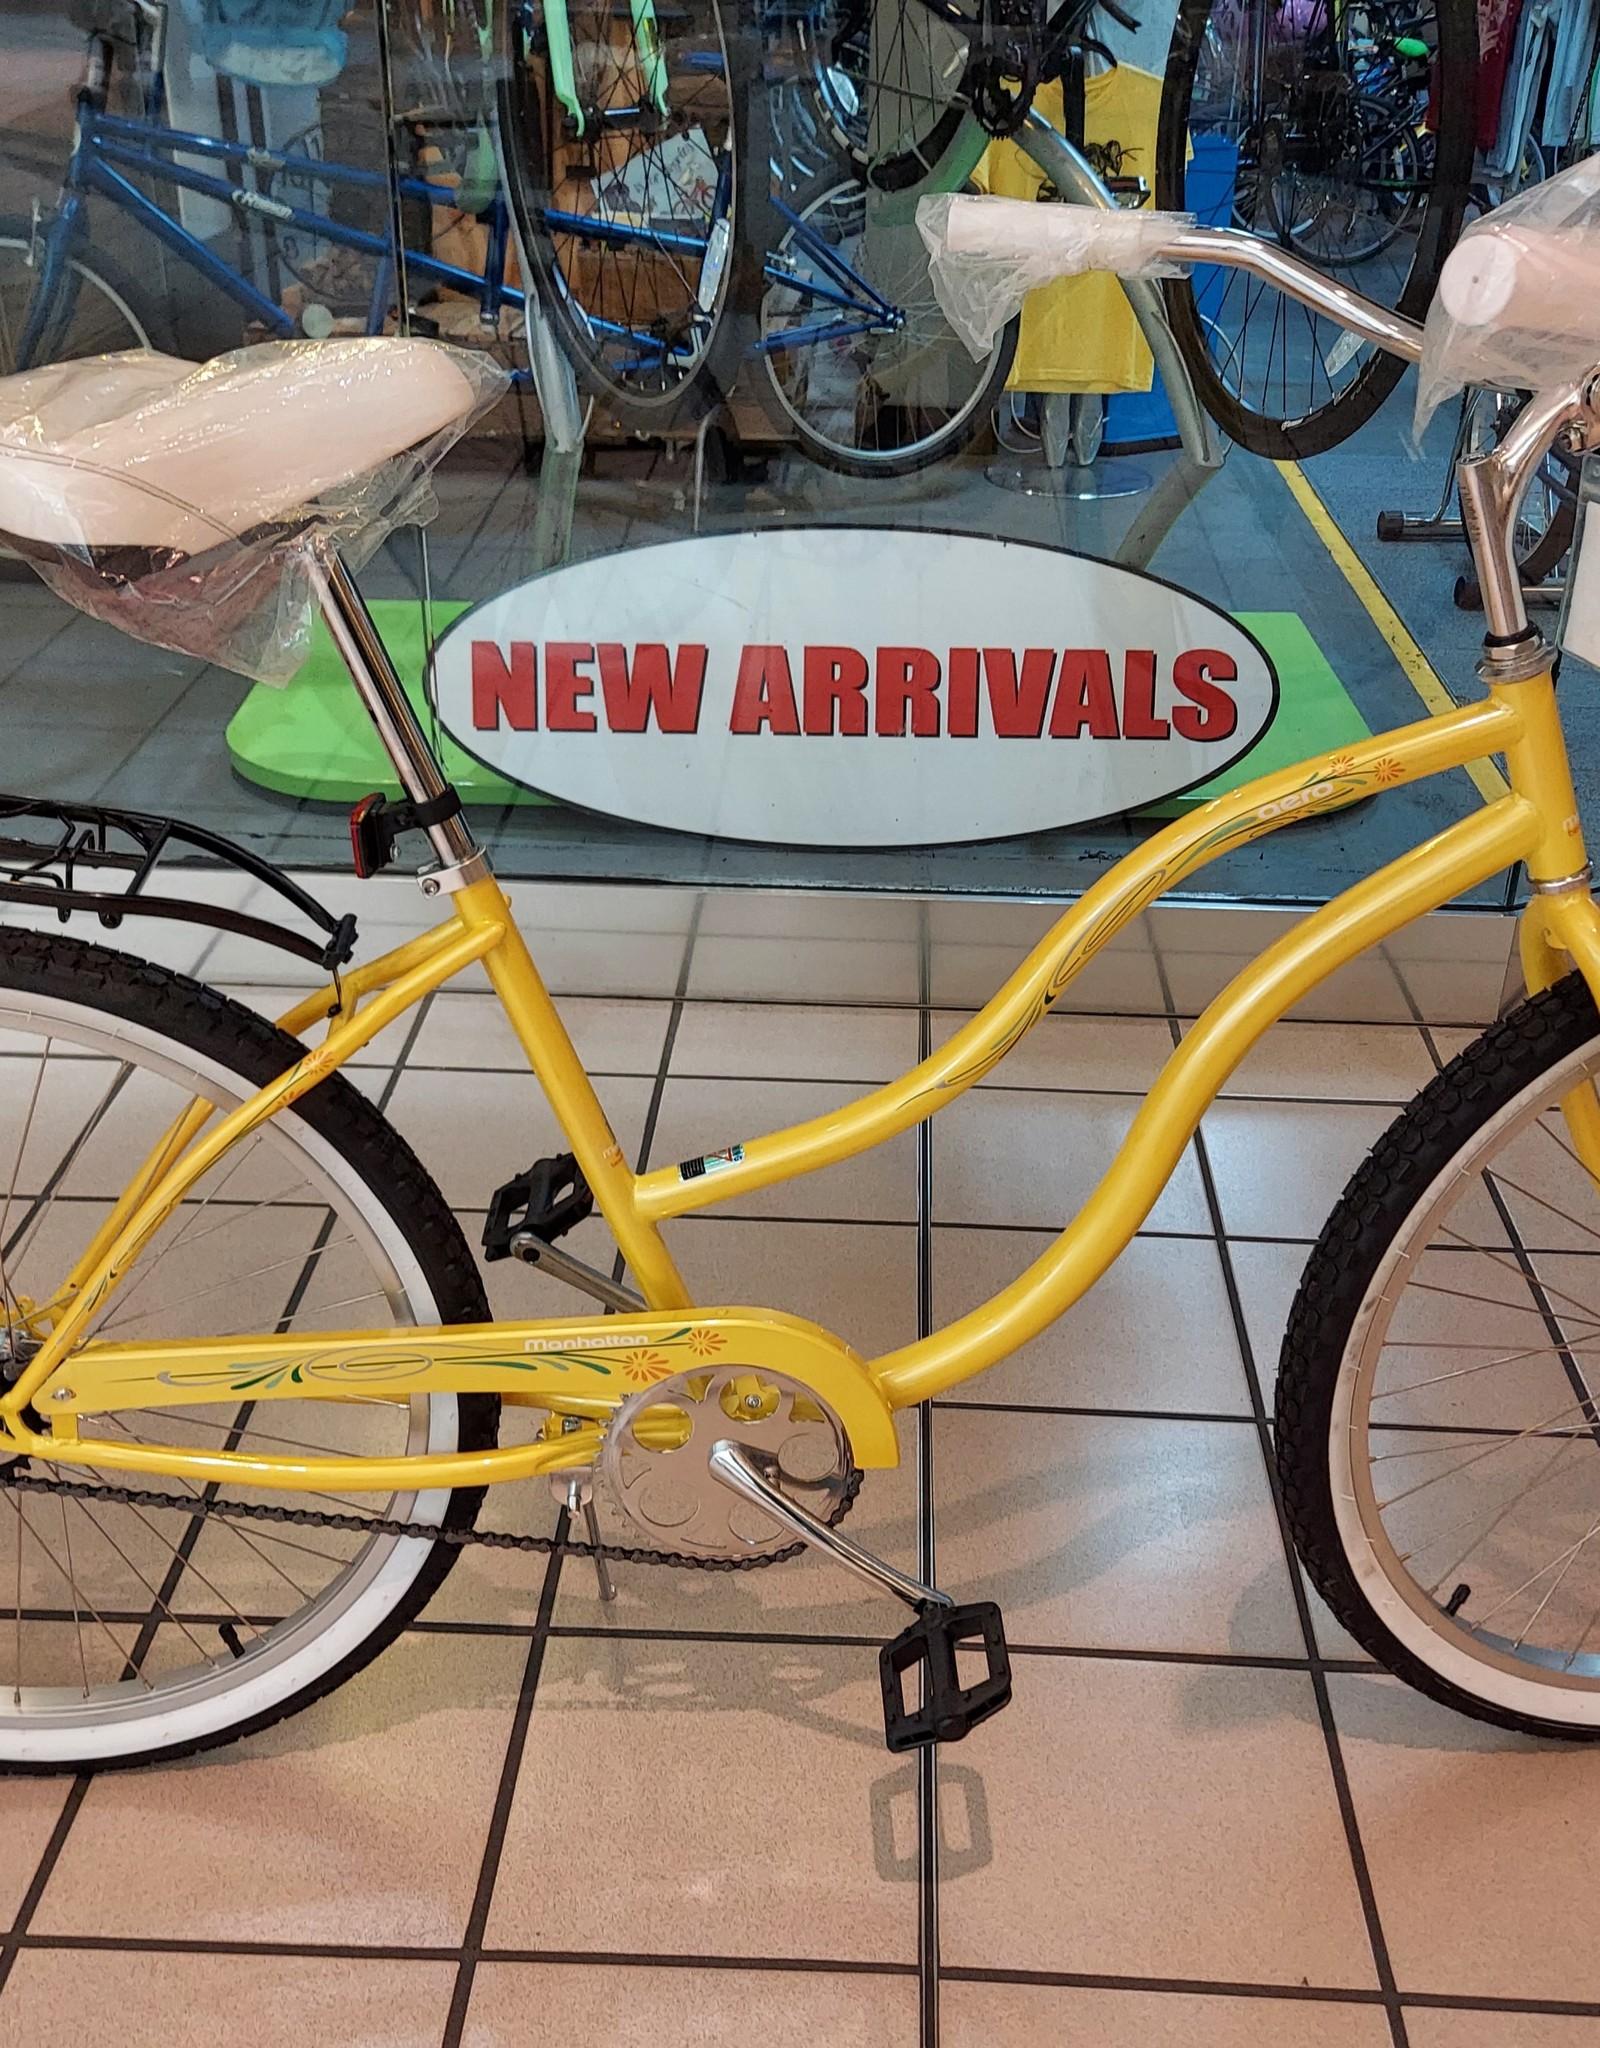 KHS KHS Aero Yellow Ladies Cruiser 2021 w/ Rack Package